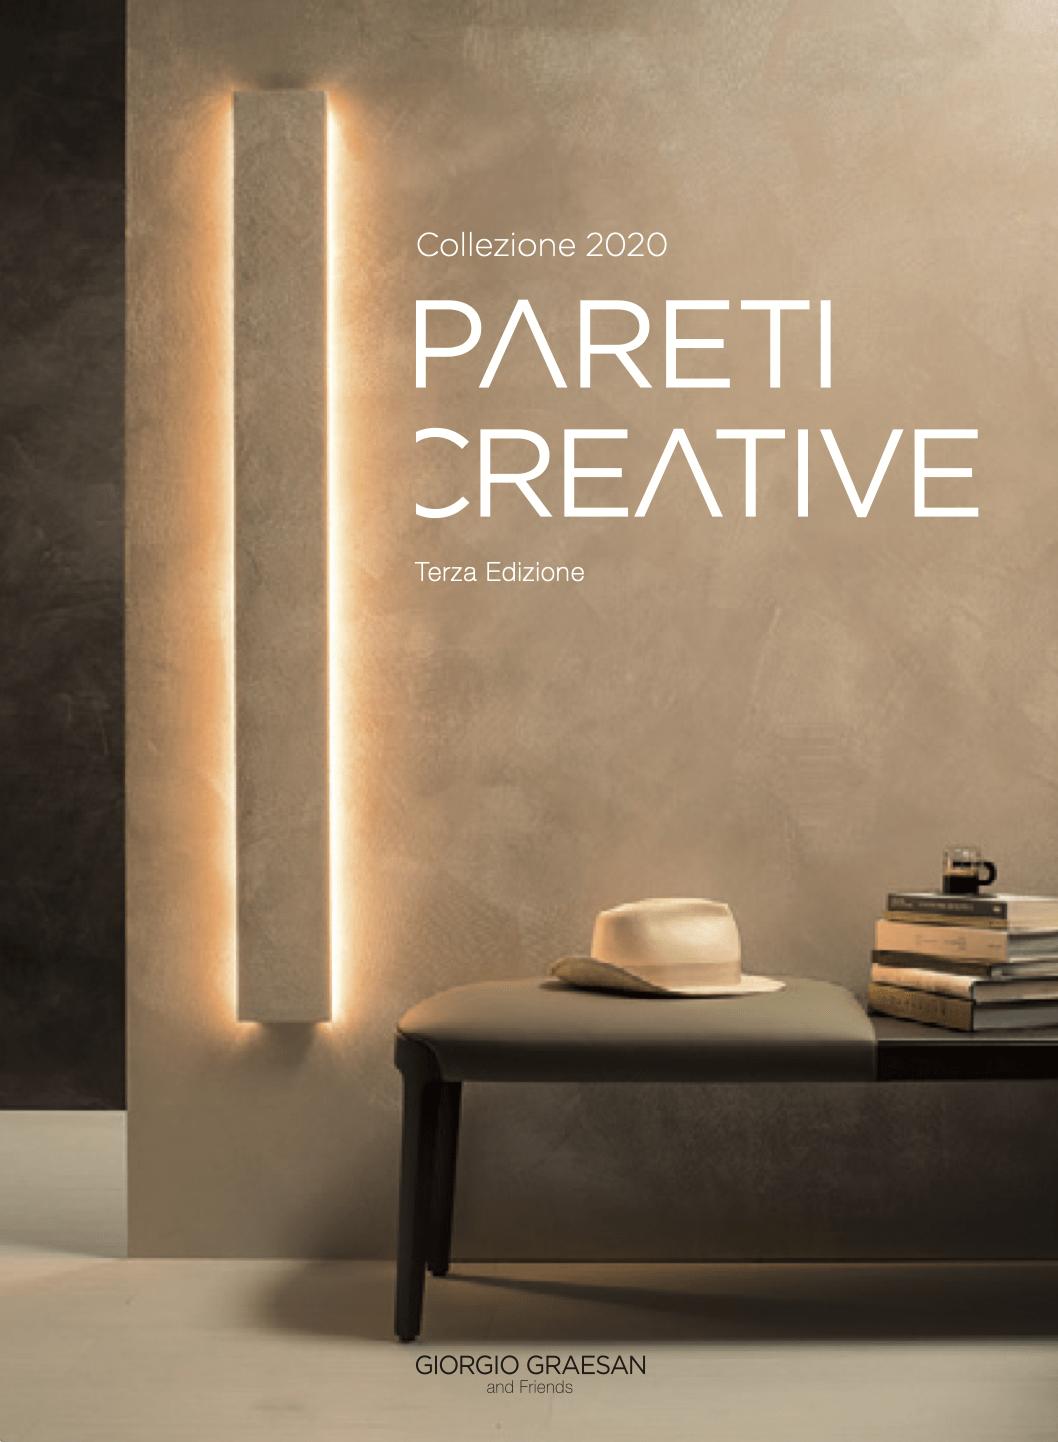 pareti creative catalogo